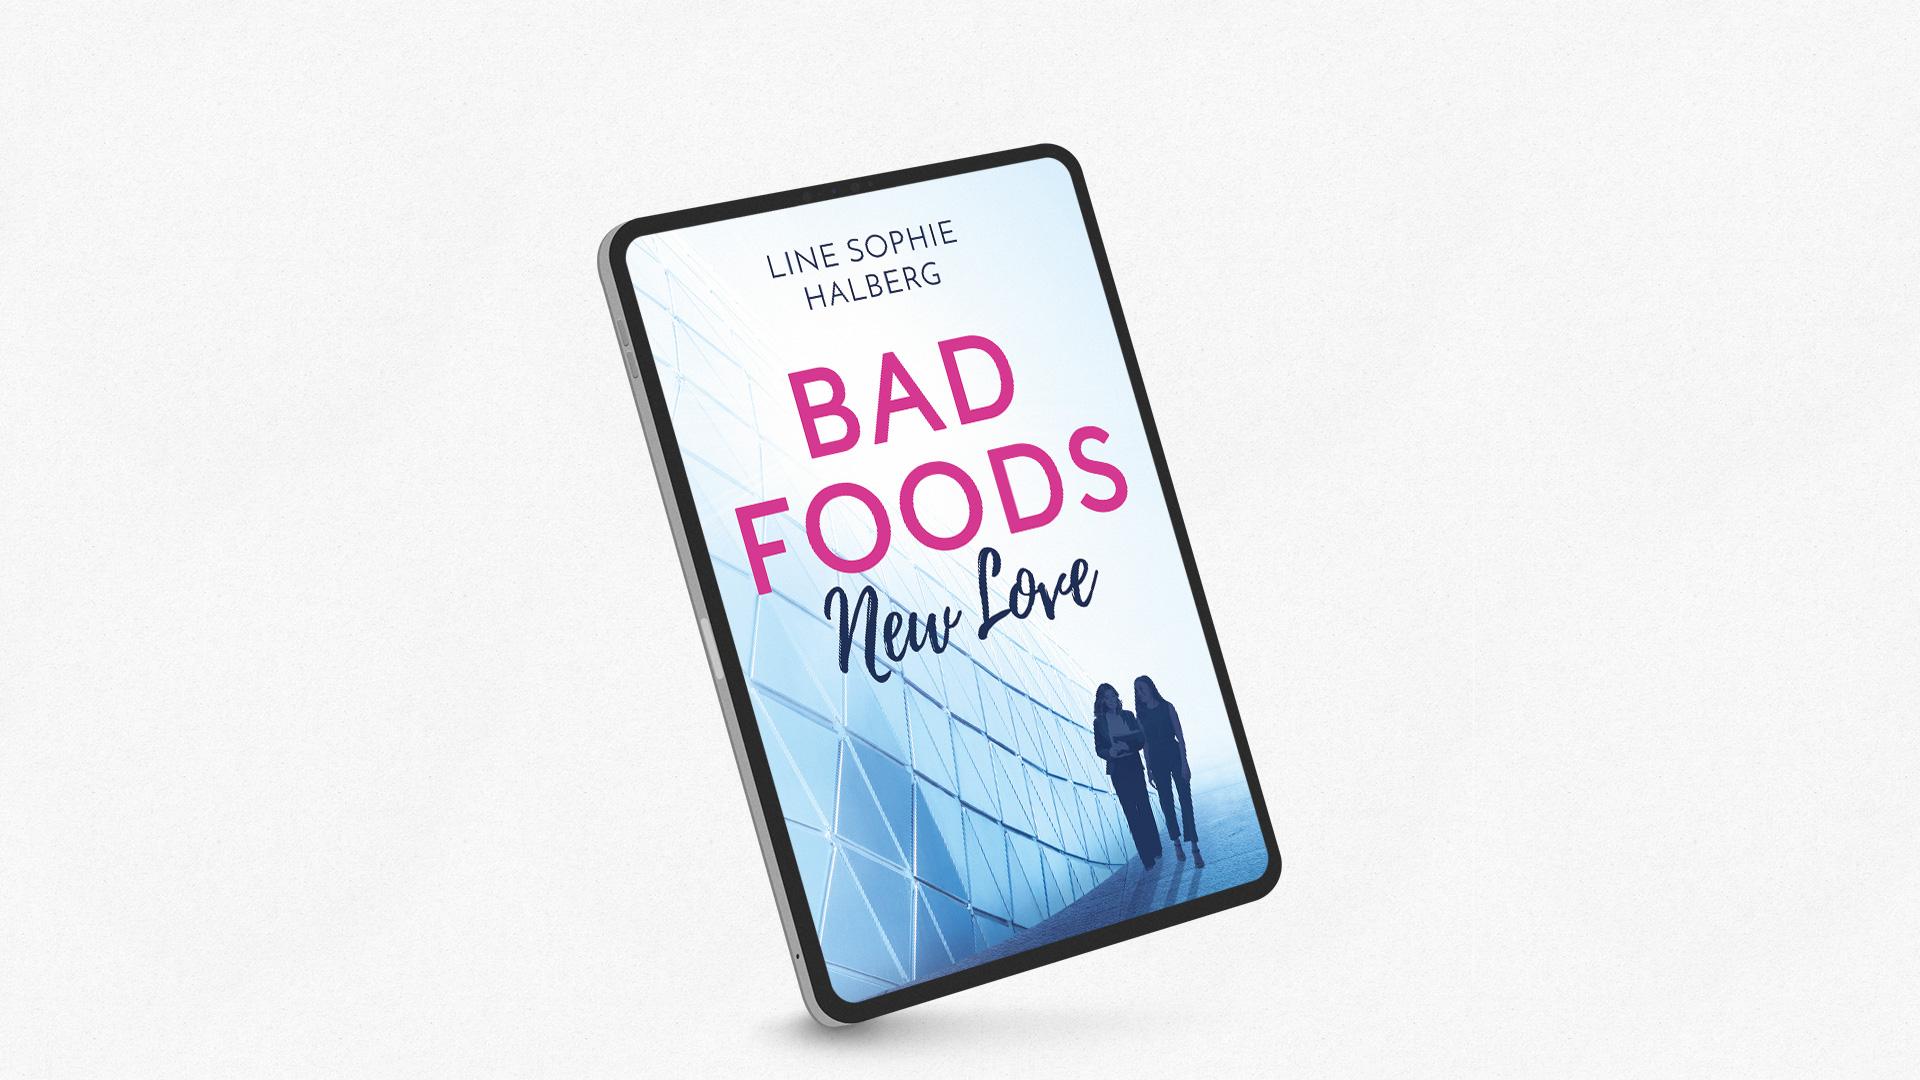 Bad Foods – New Love